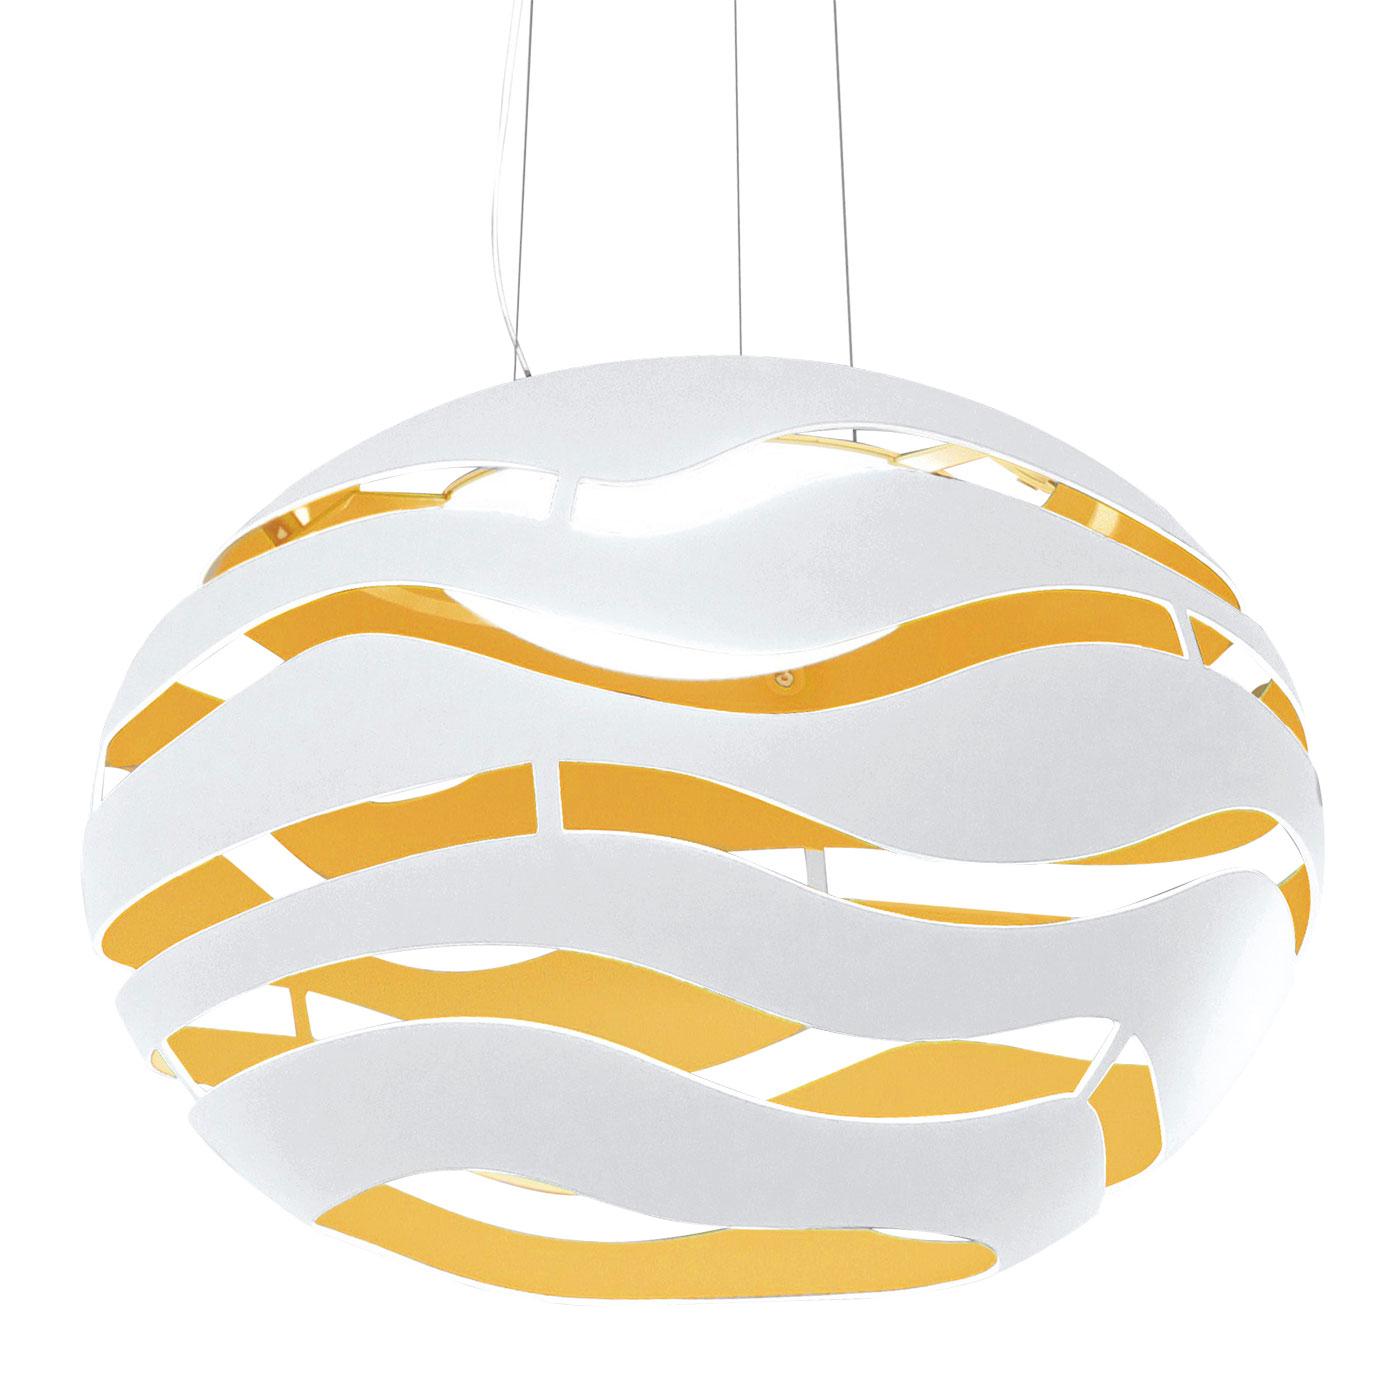 Tree Series S50 Lámpara colgante Halo 130W ECO - Blanco interior dorado